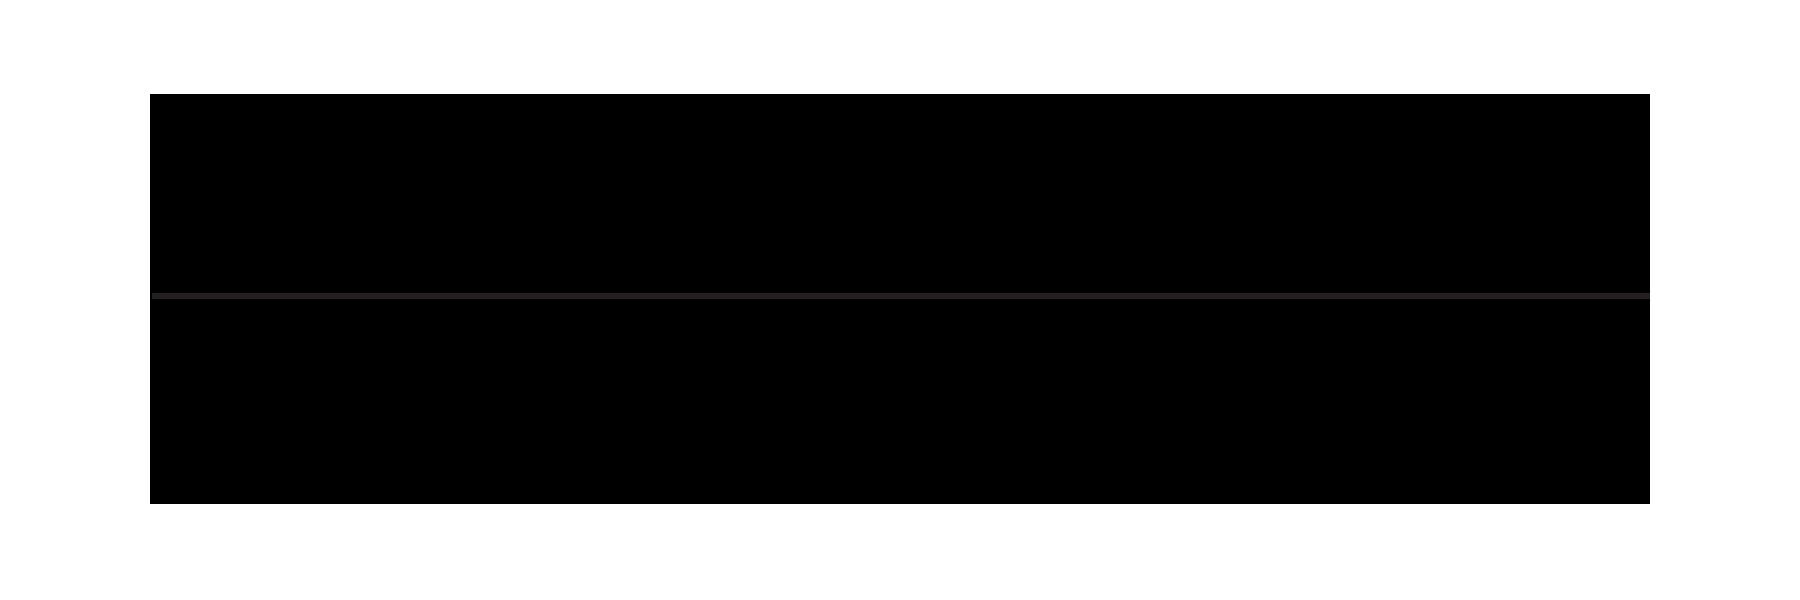 JoAnne_McArthur_WeAnimals_vertical_black.jpg